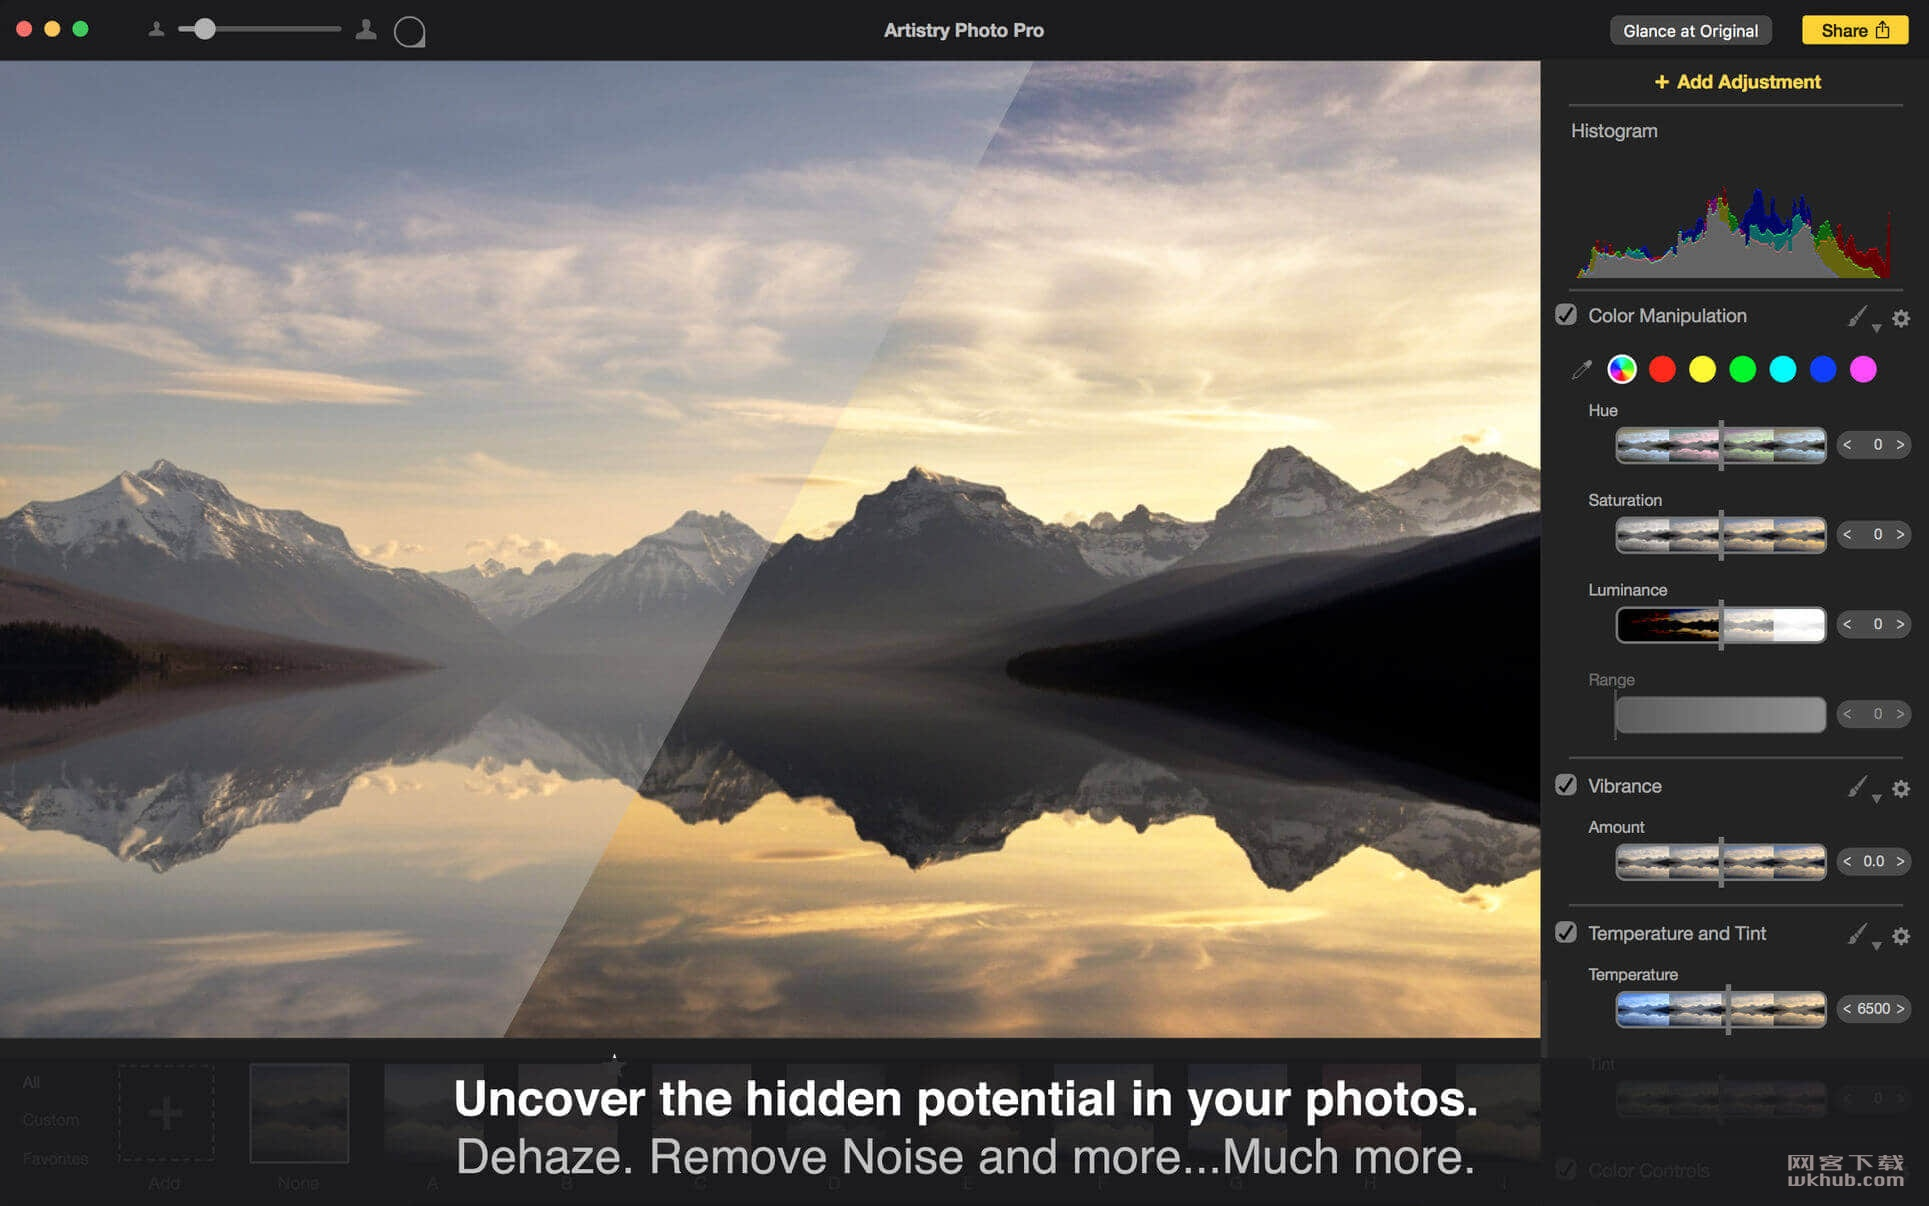 Artistry Photo Pro 3.0 功能强大的照片编辑器